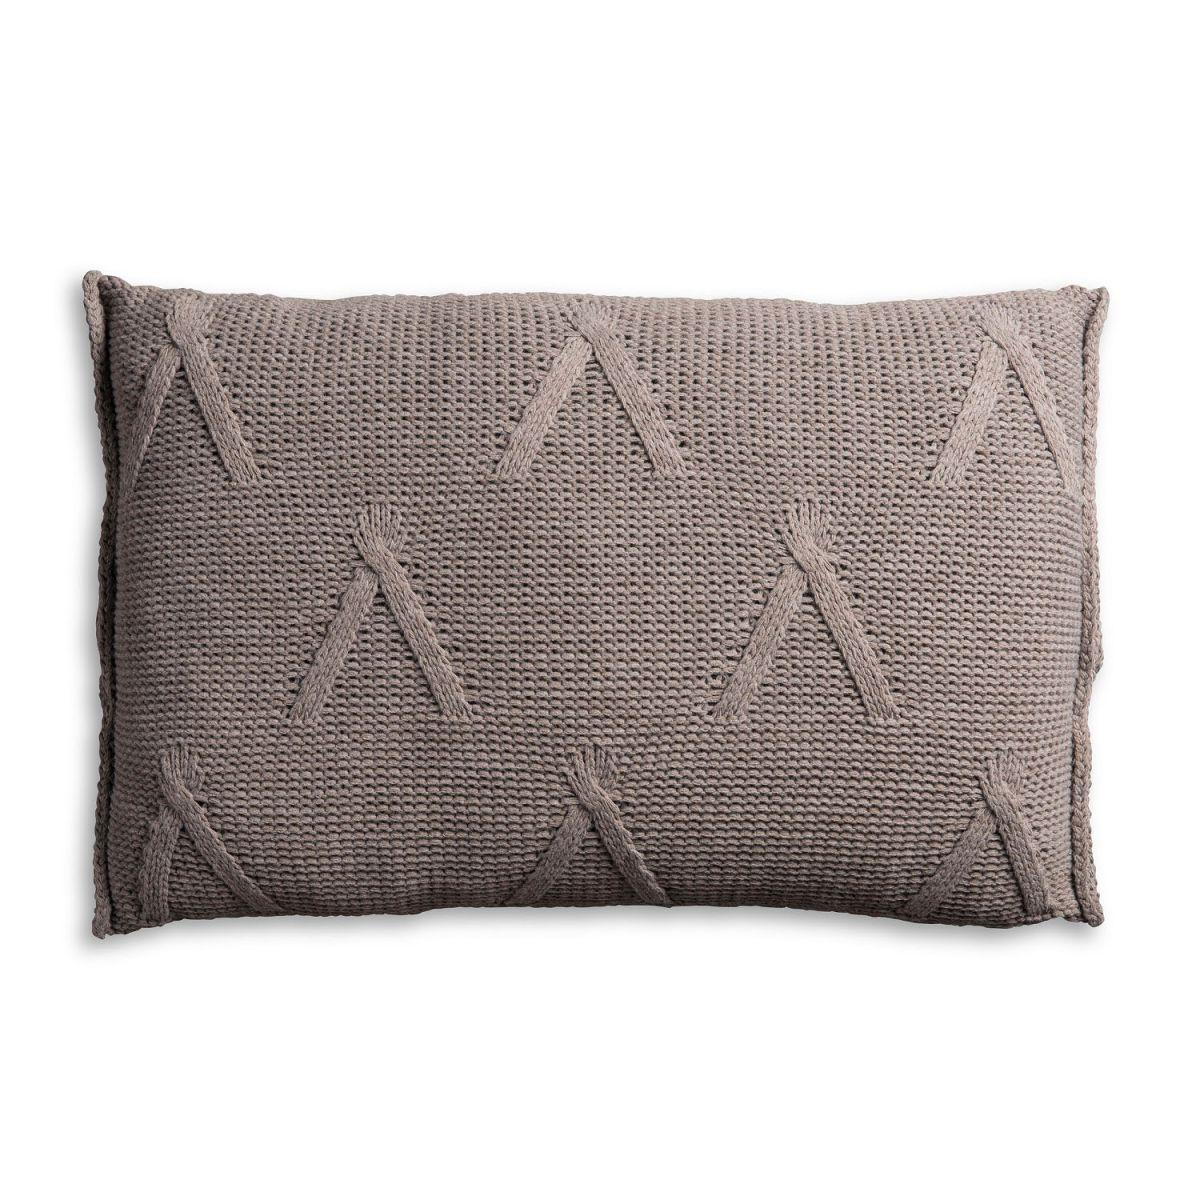 knit factory 1101329 kussen 60x40 aran taupe 2